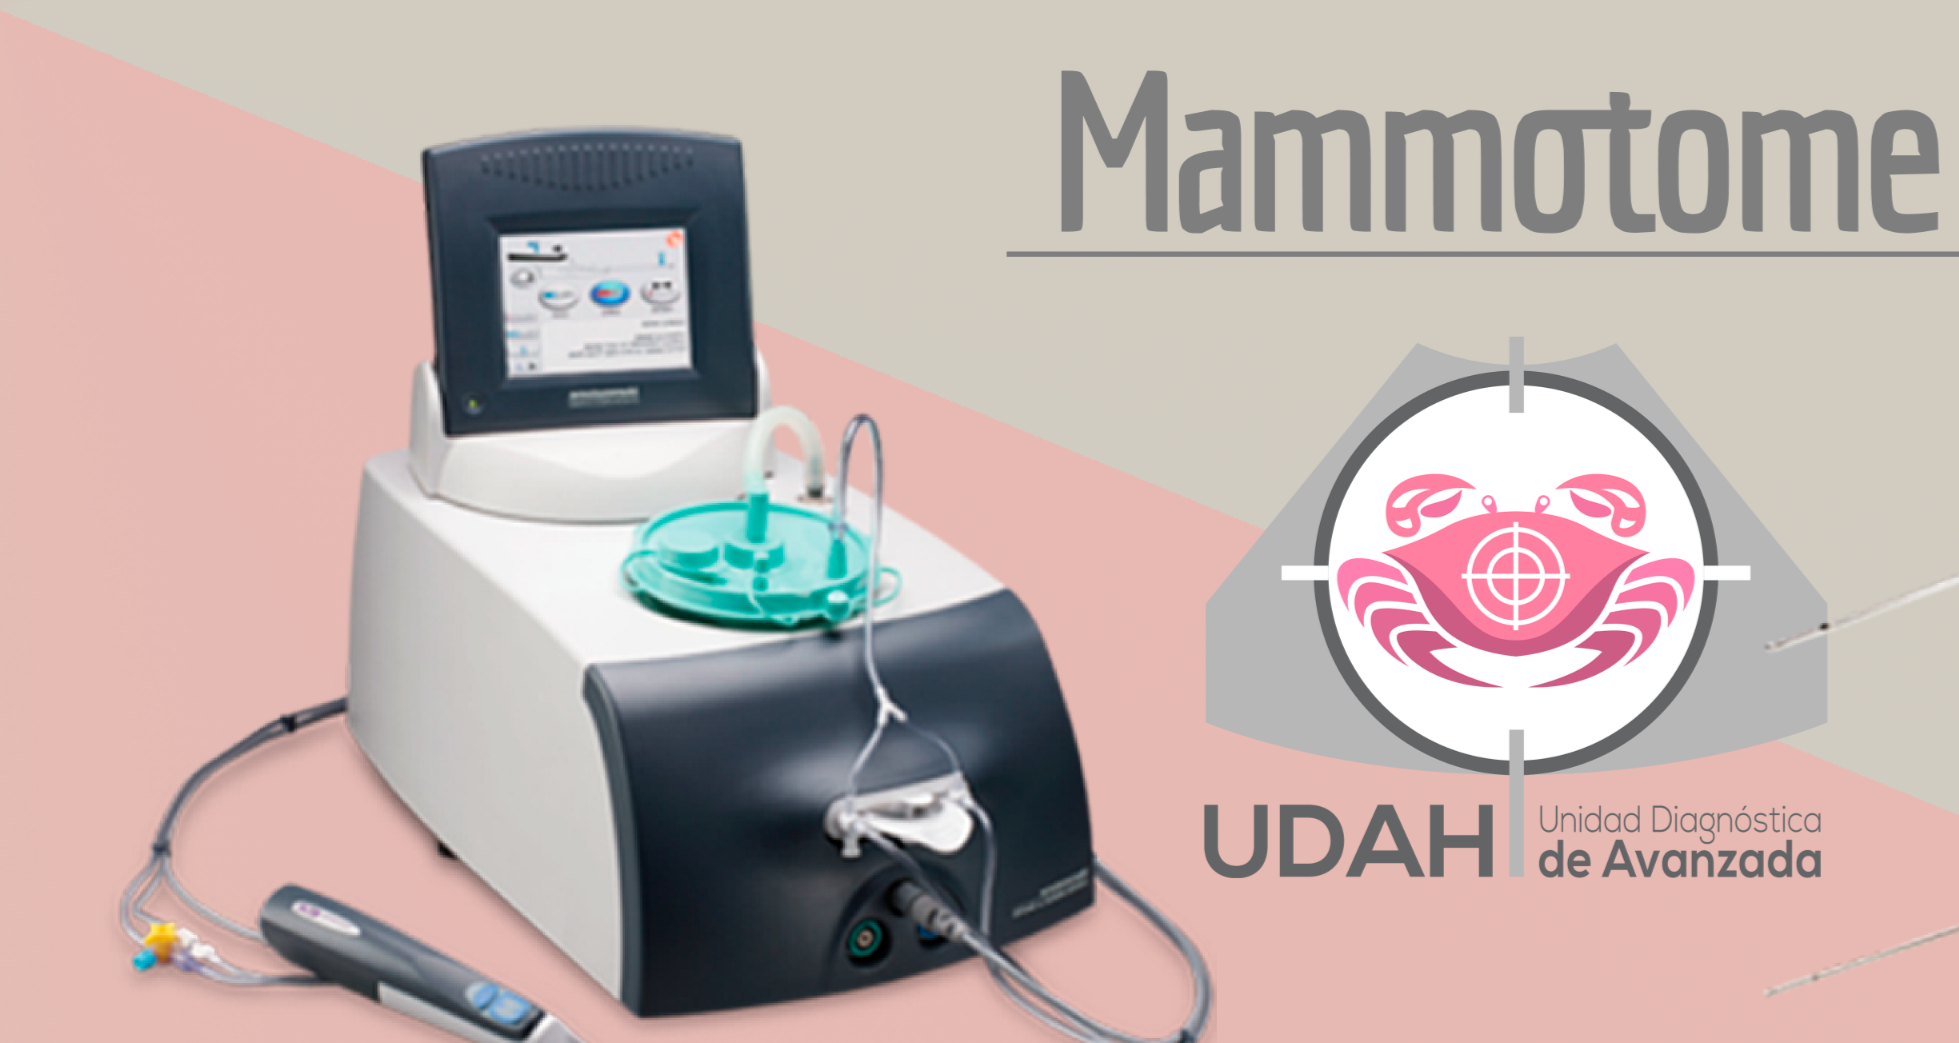 Biopsia Mammotome